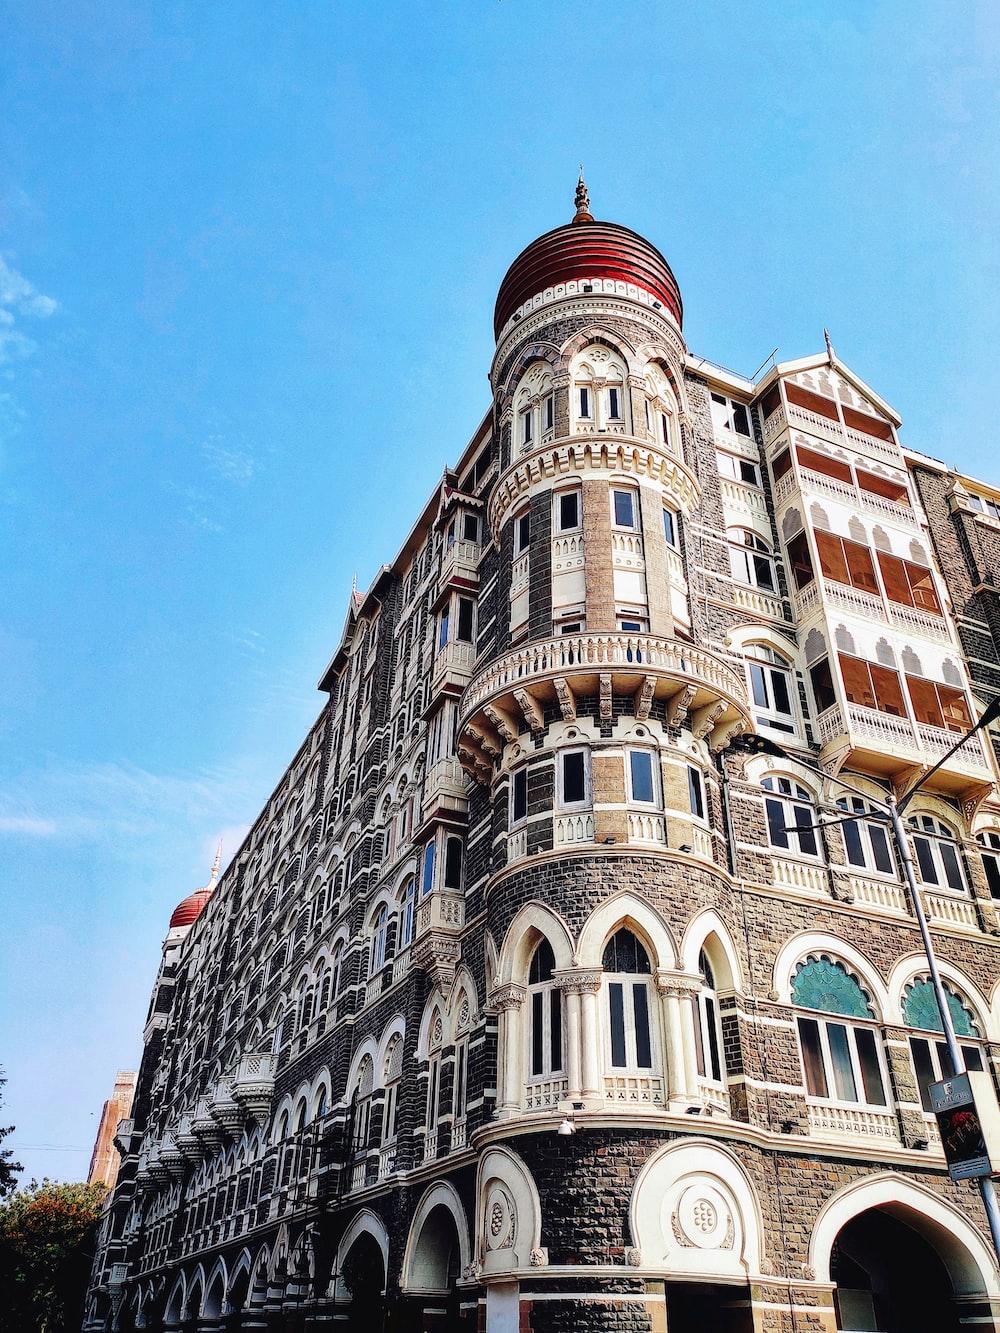 Taj Mahal Palace Hotel, Mumbai, India Pictures | Download